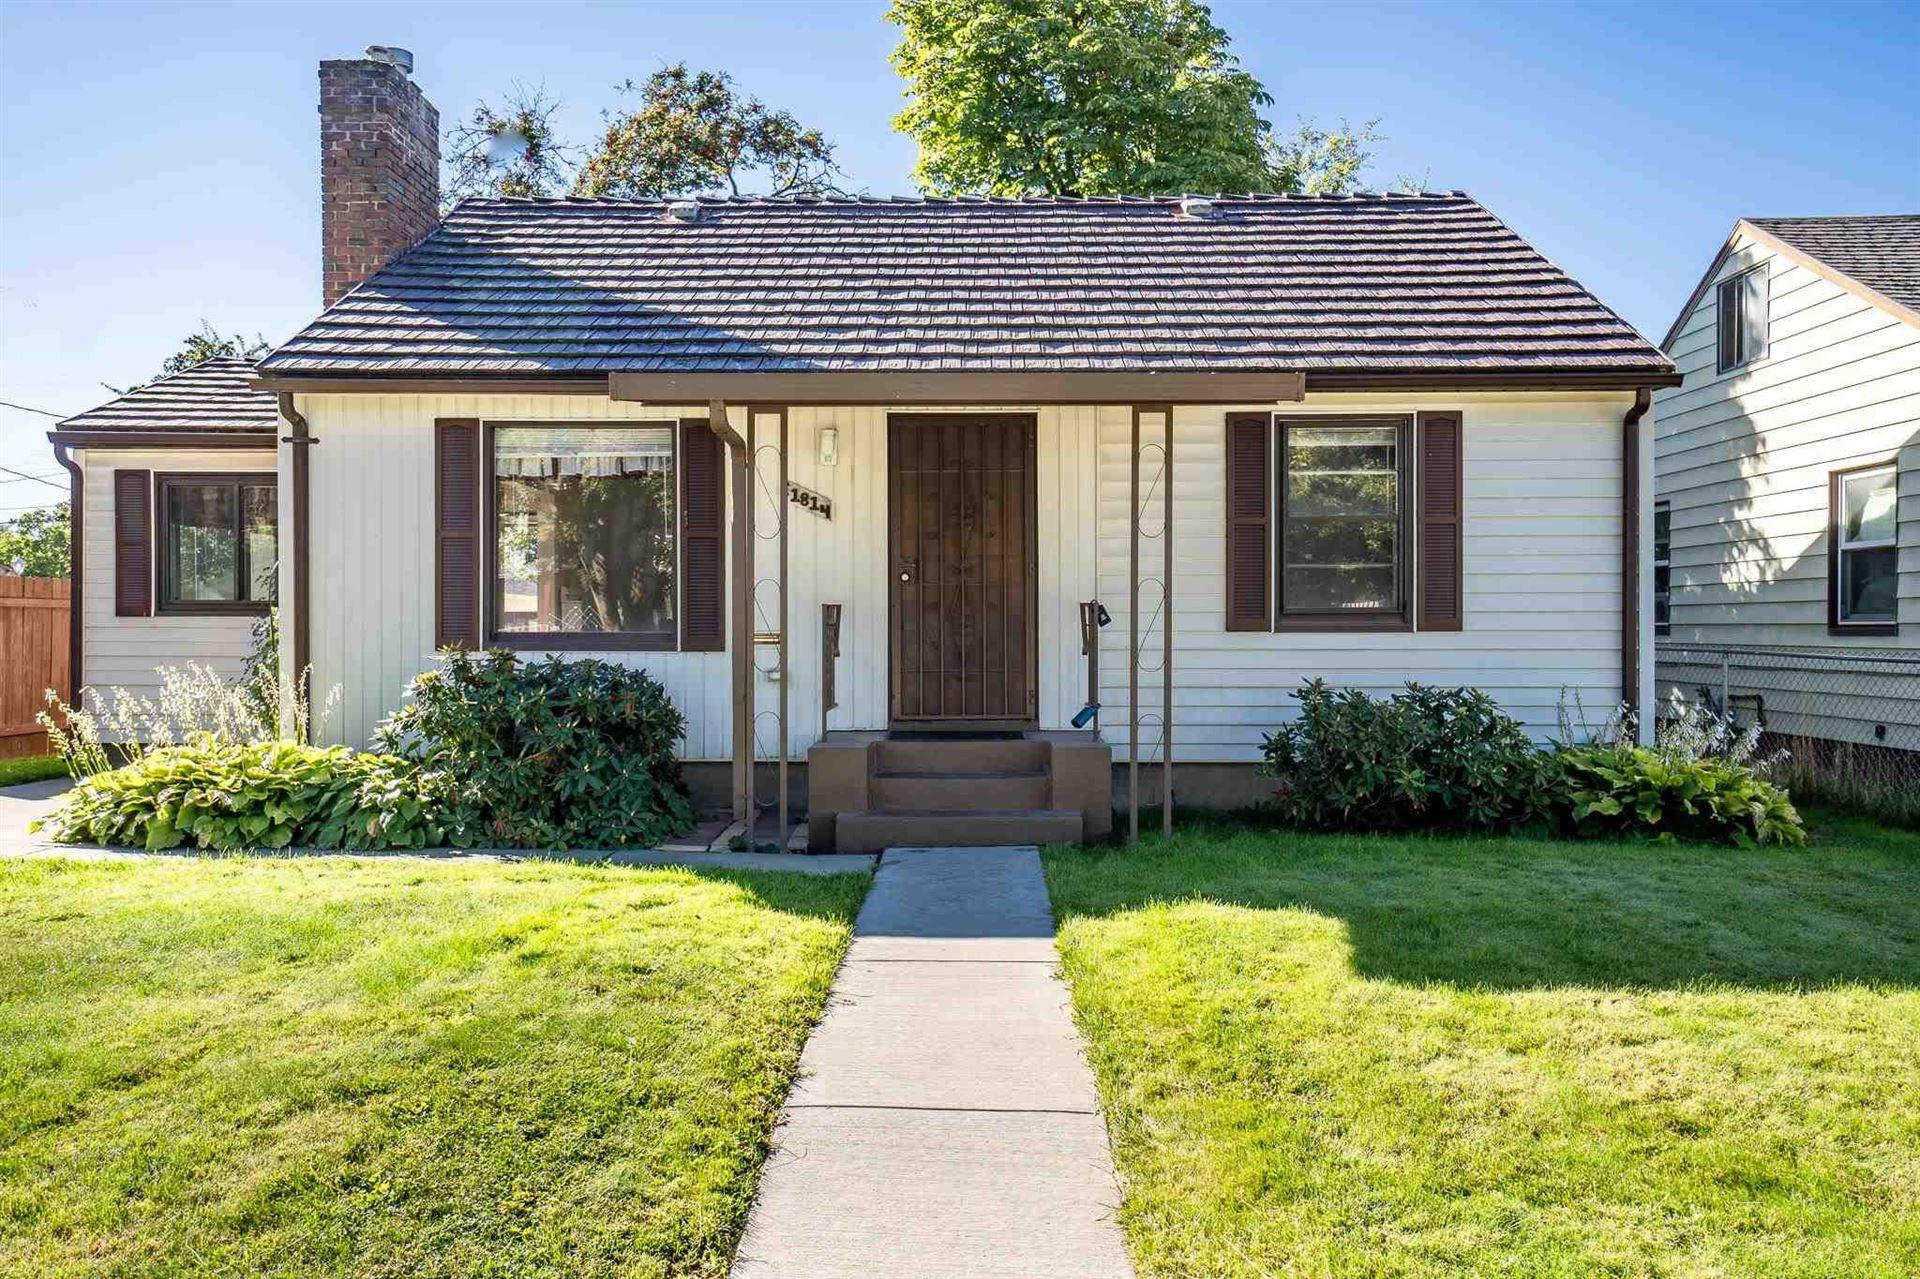 1814 E Glass Ave, Spokane, WA 99207 - #: 202122861